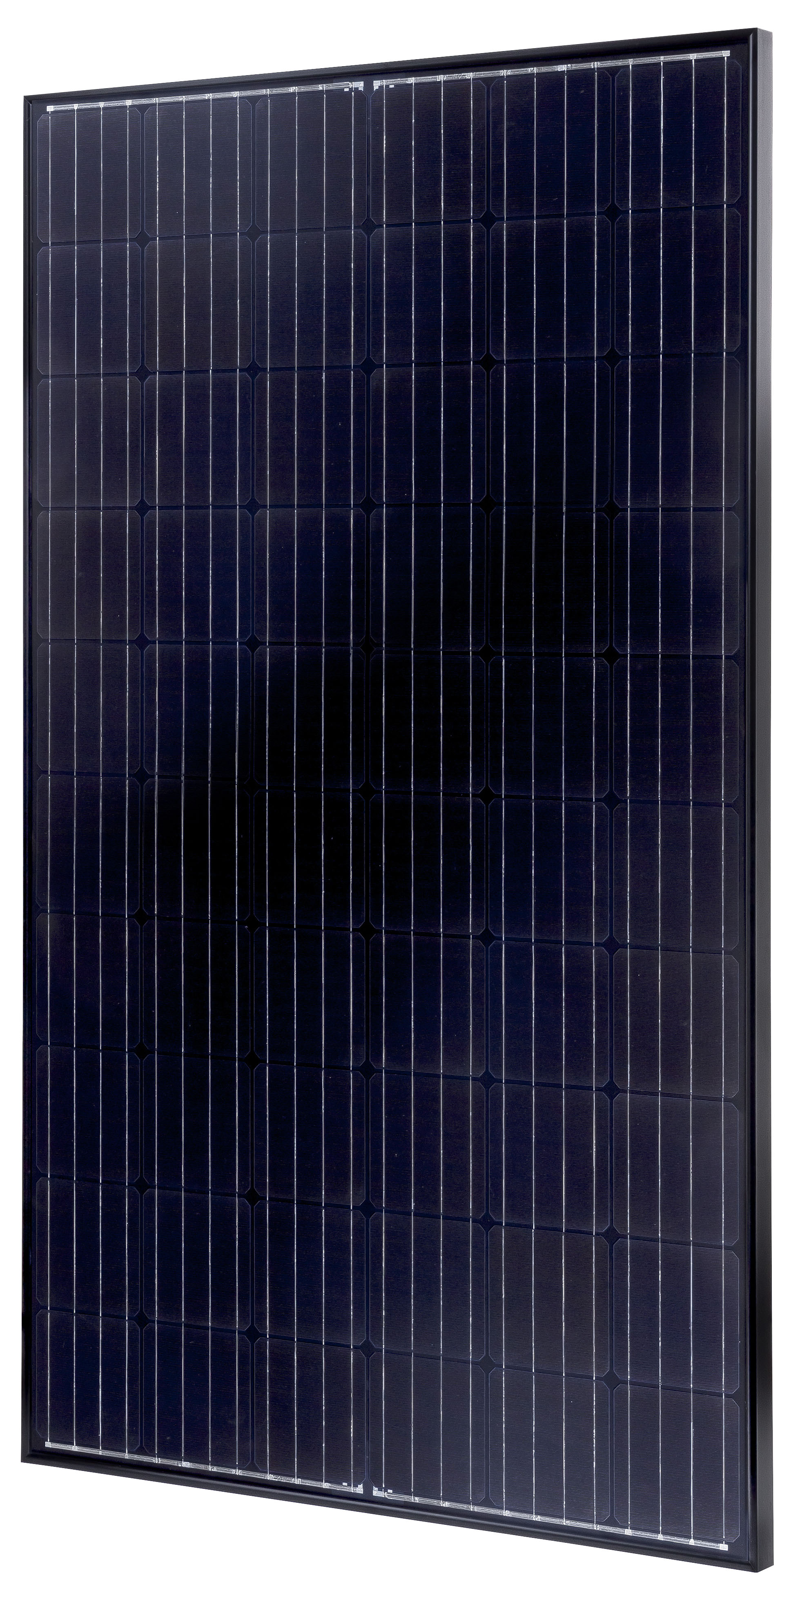 Mission Solar Energy Named Supplier Of Petersen Dean